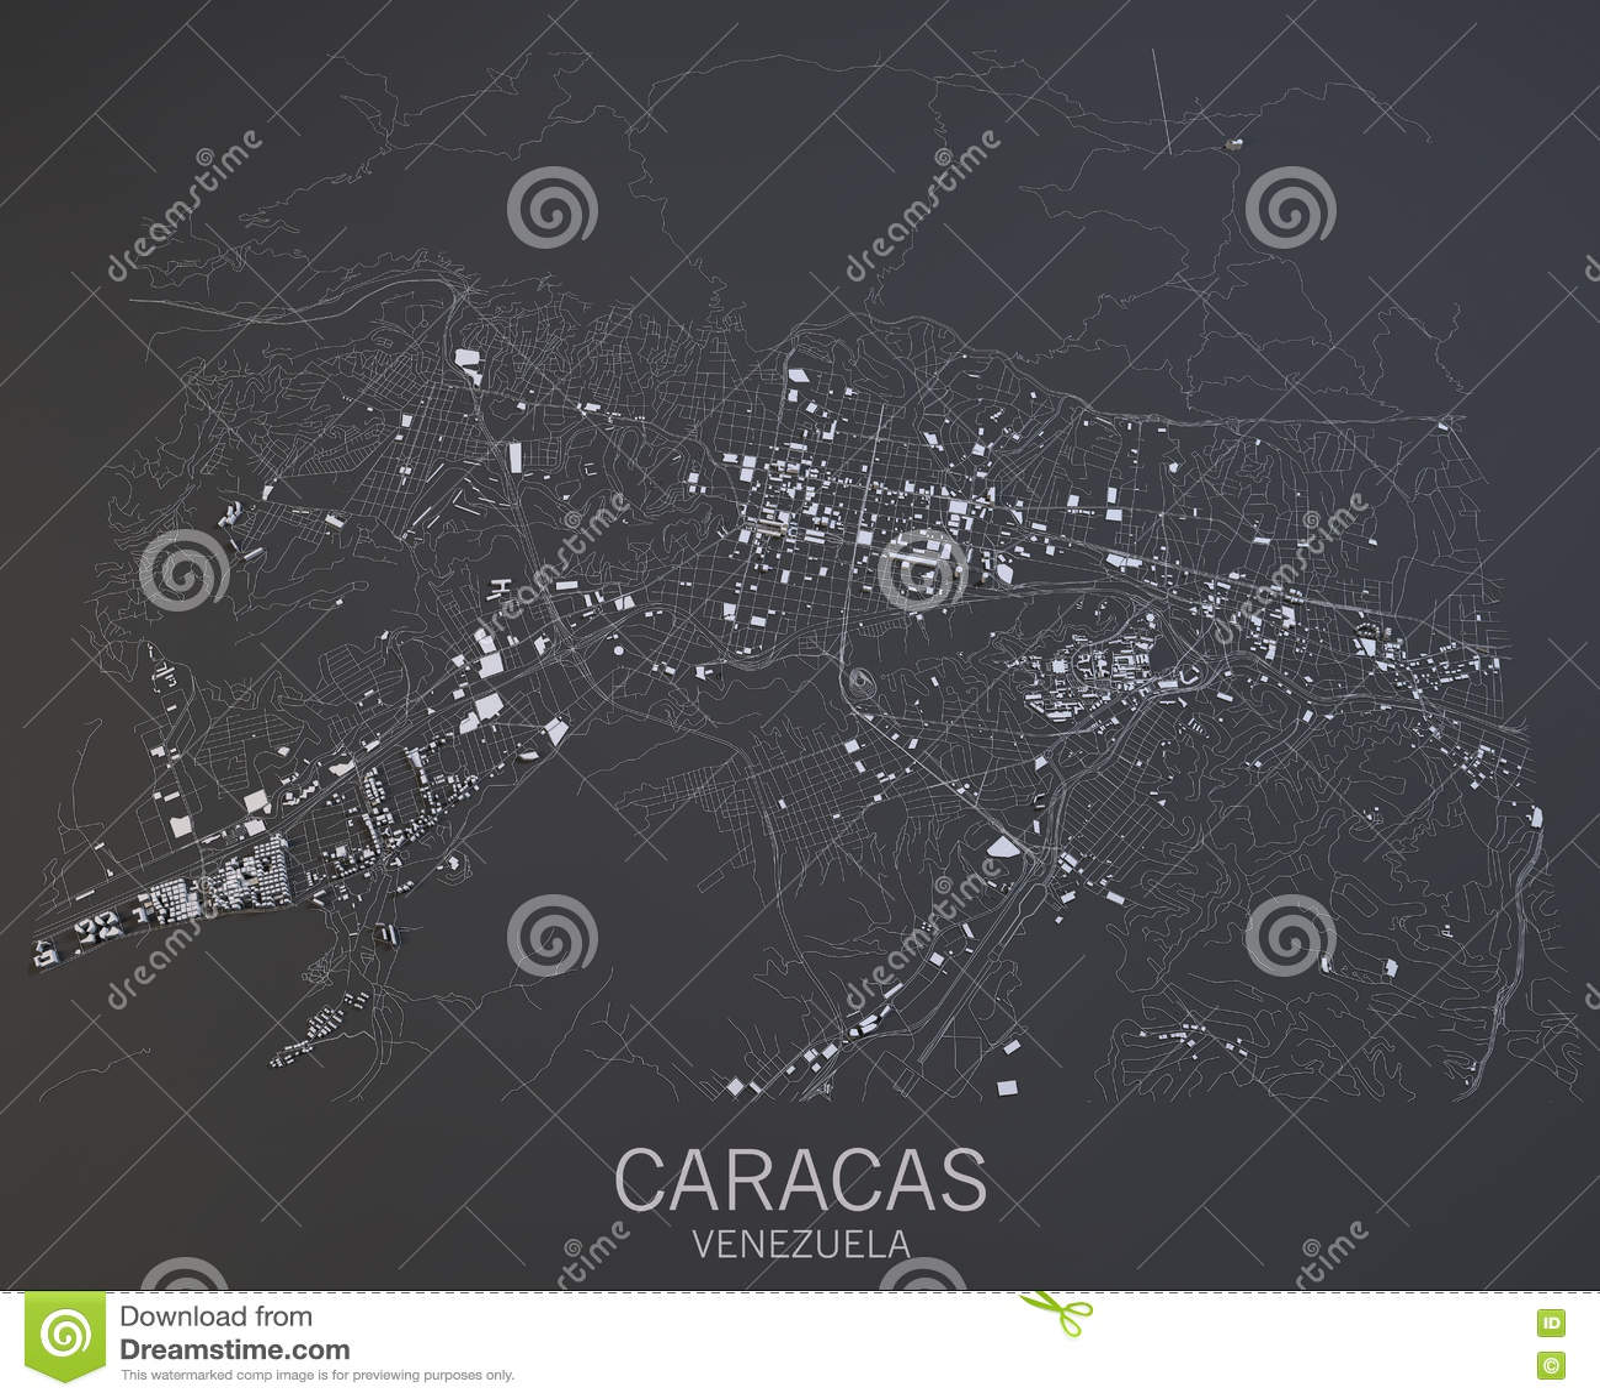 Caracas Map, Venezuela, Central America Stock Image - Image ... on america map panama, america map colorado, america map grenada, america map spain, america map mississippi, america map el salvador, america map uruguay, america map arizona, america map italy, america map brazil, america map jamaica, america map bahamas, america map georgia, america map texas, america map honduras, america map north america, america map philippines, america map canada,